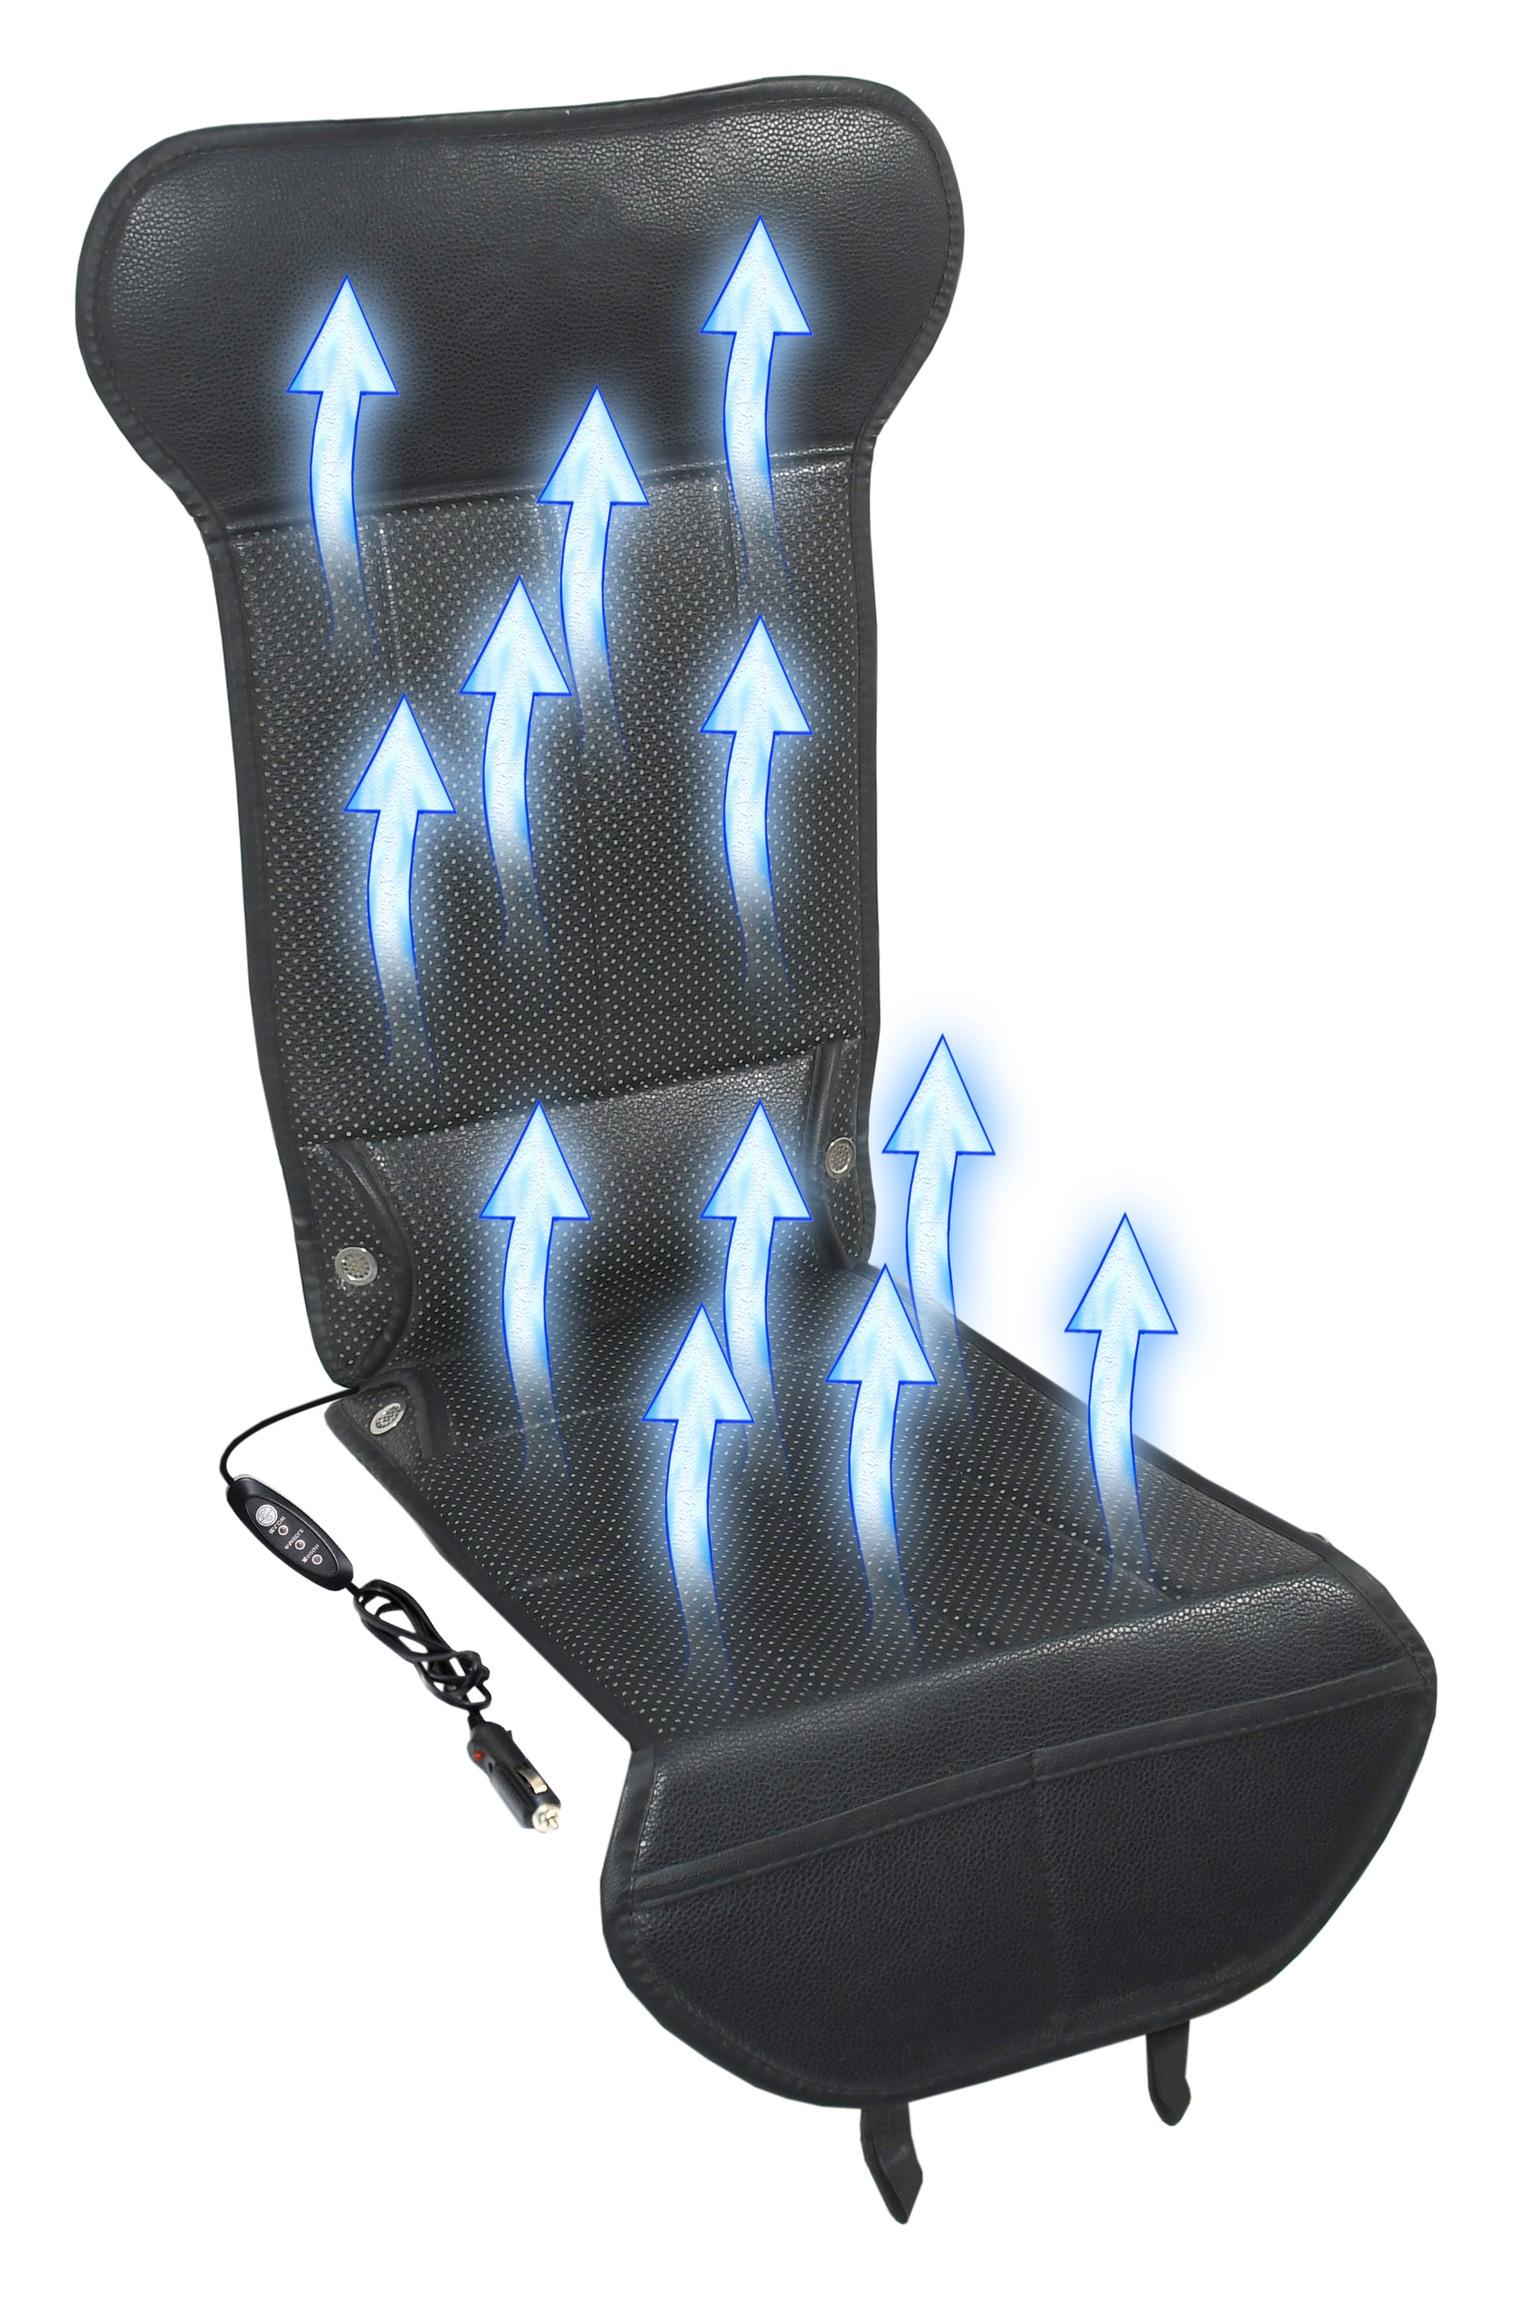 Potah sedadla s ventilací 12V STRICK AIR black